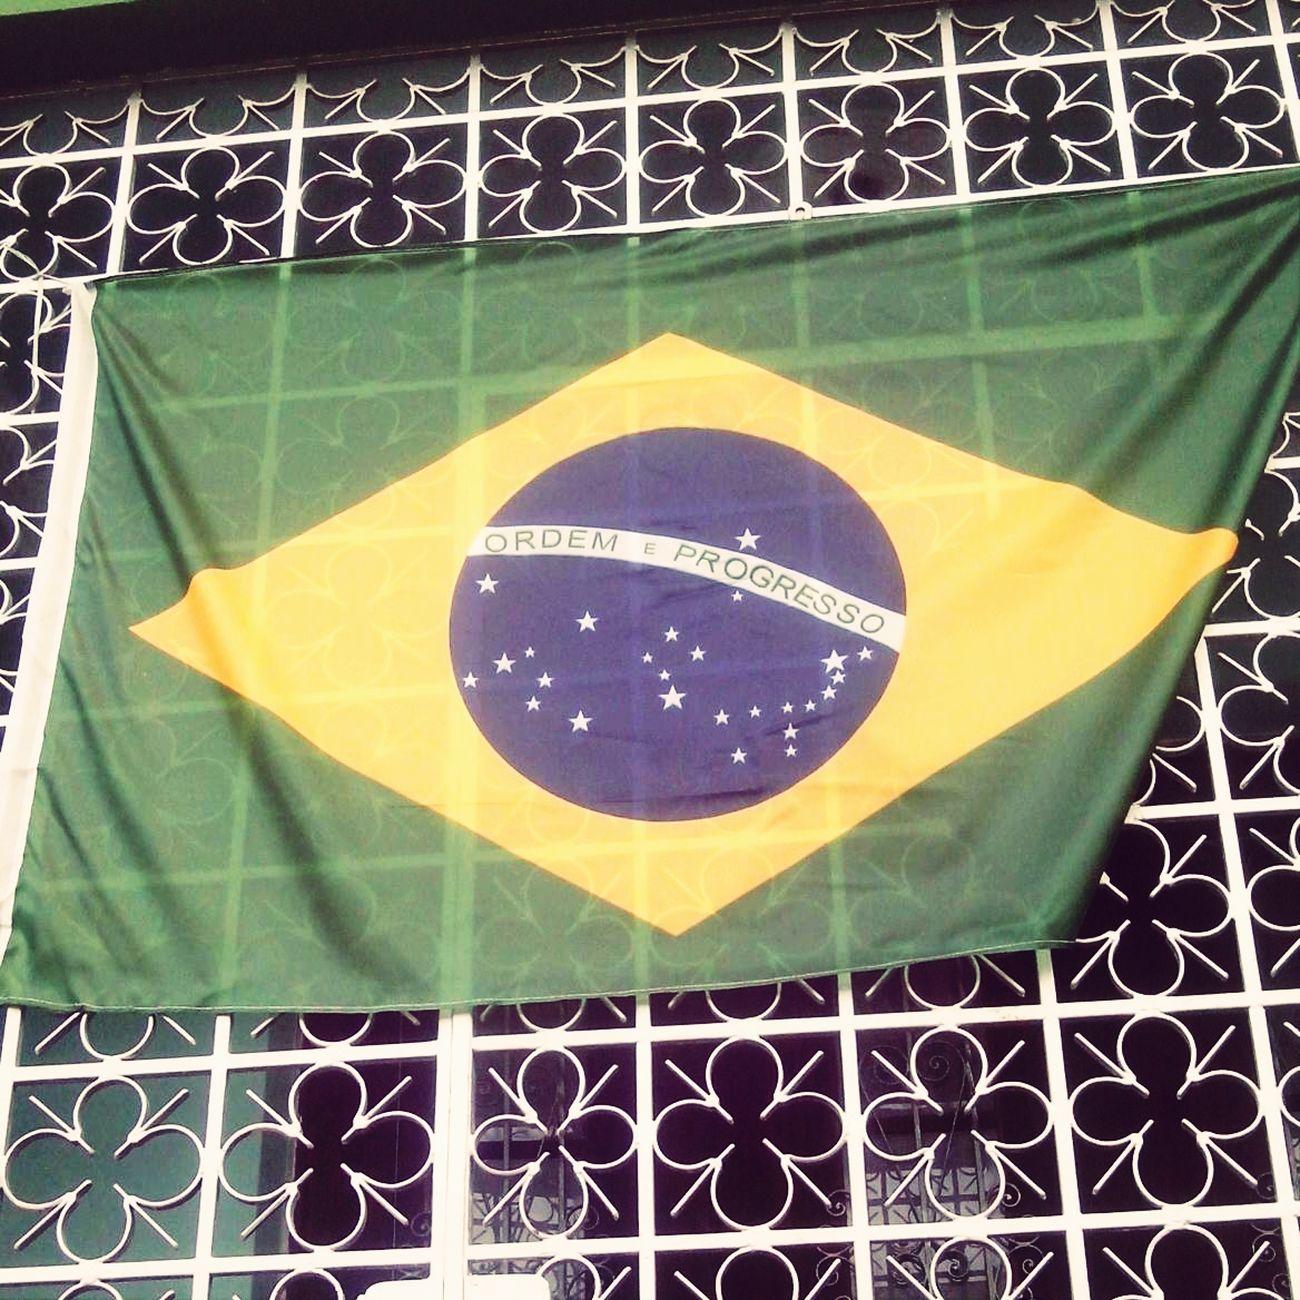 """...dos filhos deste solo és mãe gentil, Pátria amada, Brasil!"" So Proud I Believe No Giving Up Love"